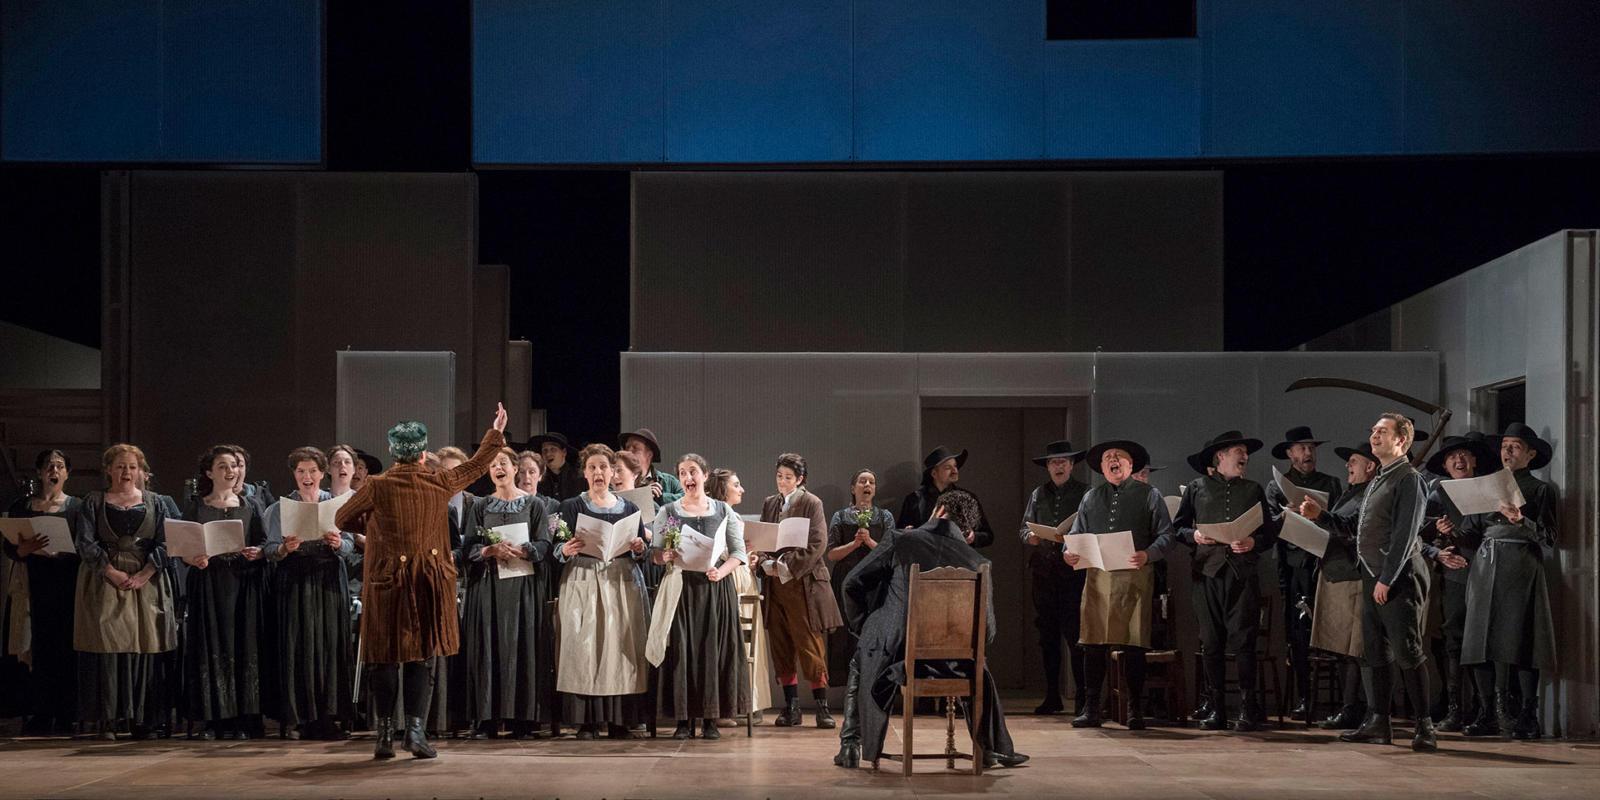 ENO 17/18: The Marriage of Figaro ENO Chorus Members (c) Alastair Muir